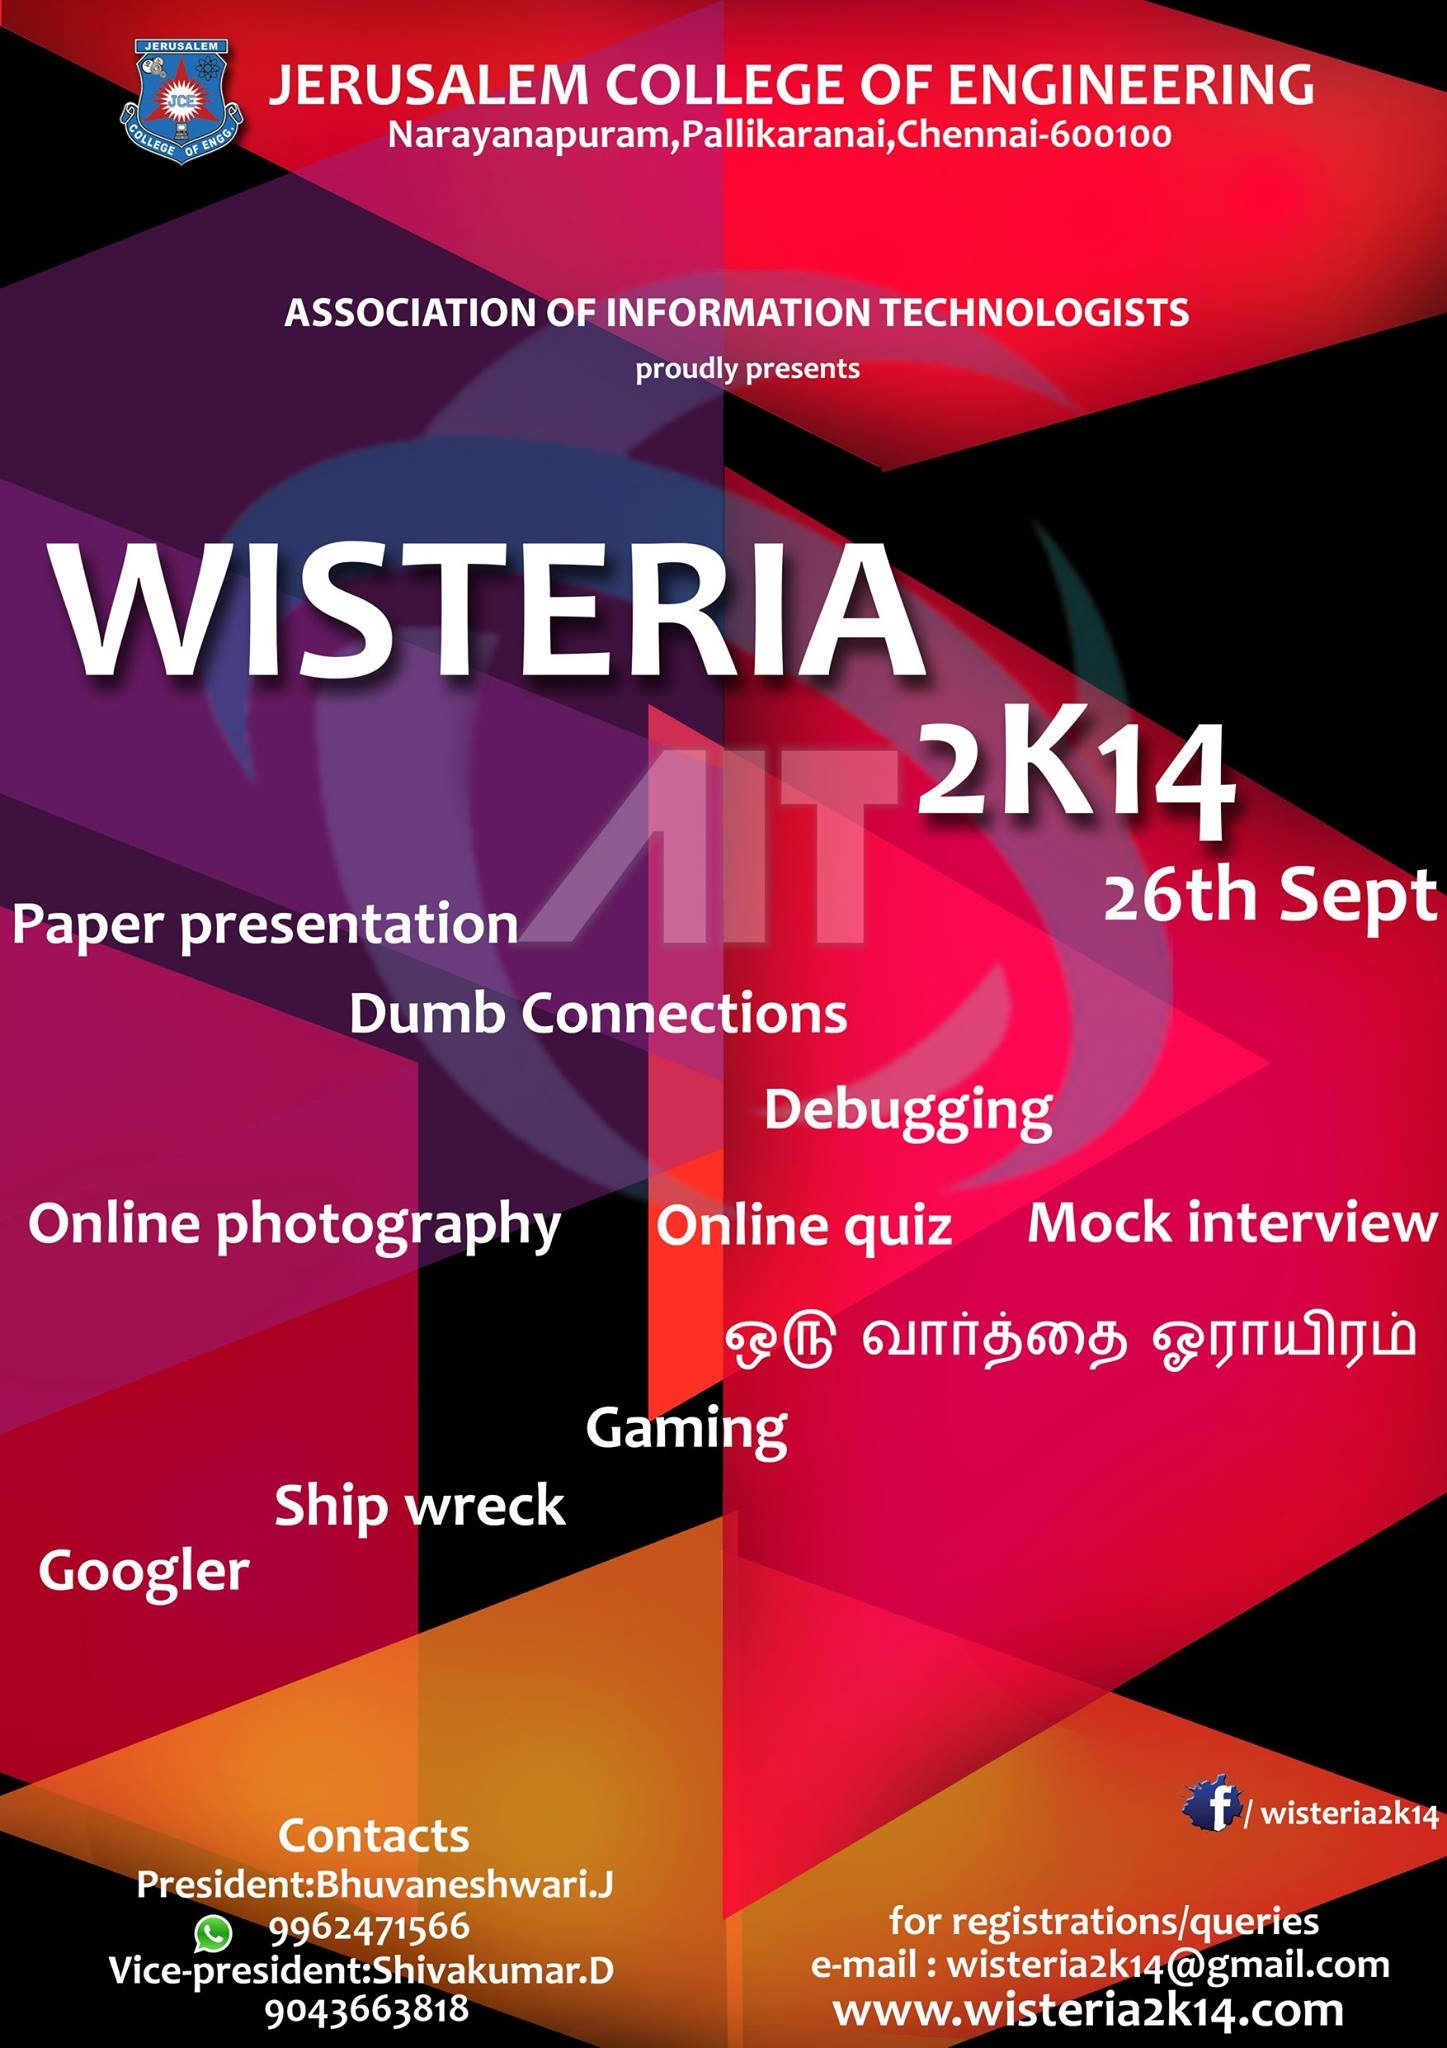 Wisteria 2k14 logo